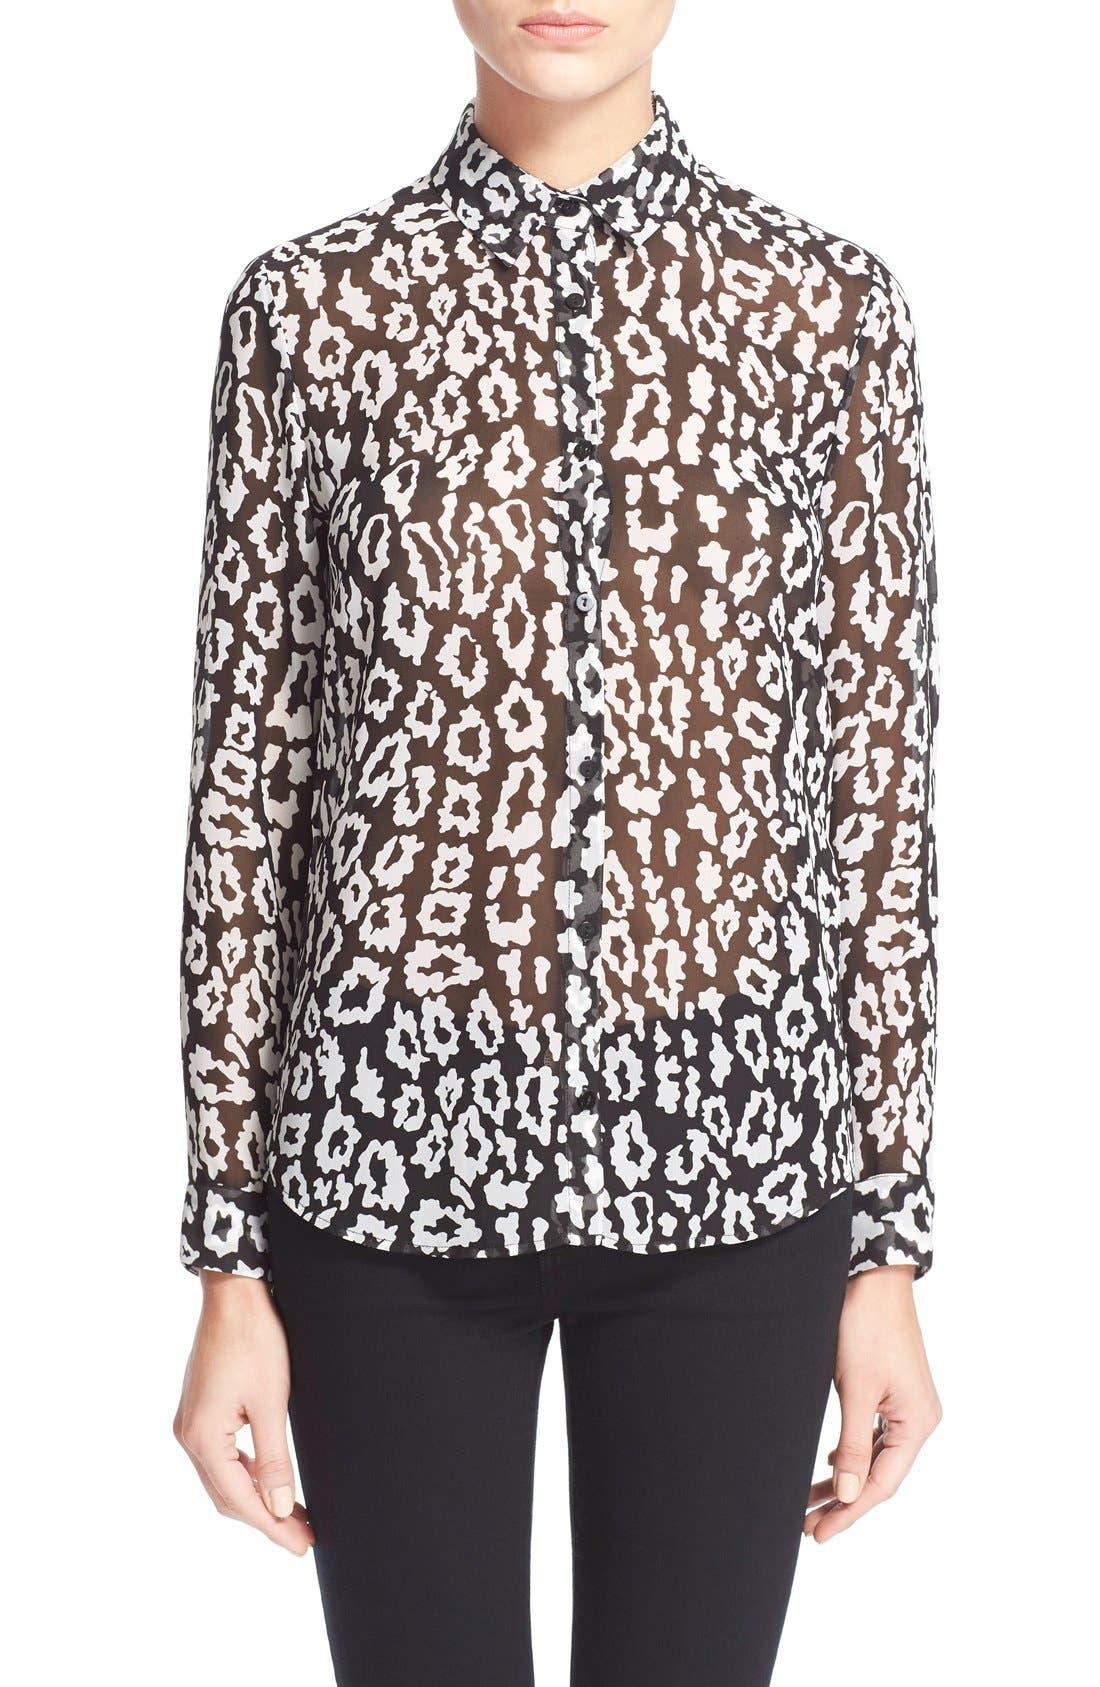 Leopard Print ChiffonShirt, Main, color, 005